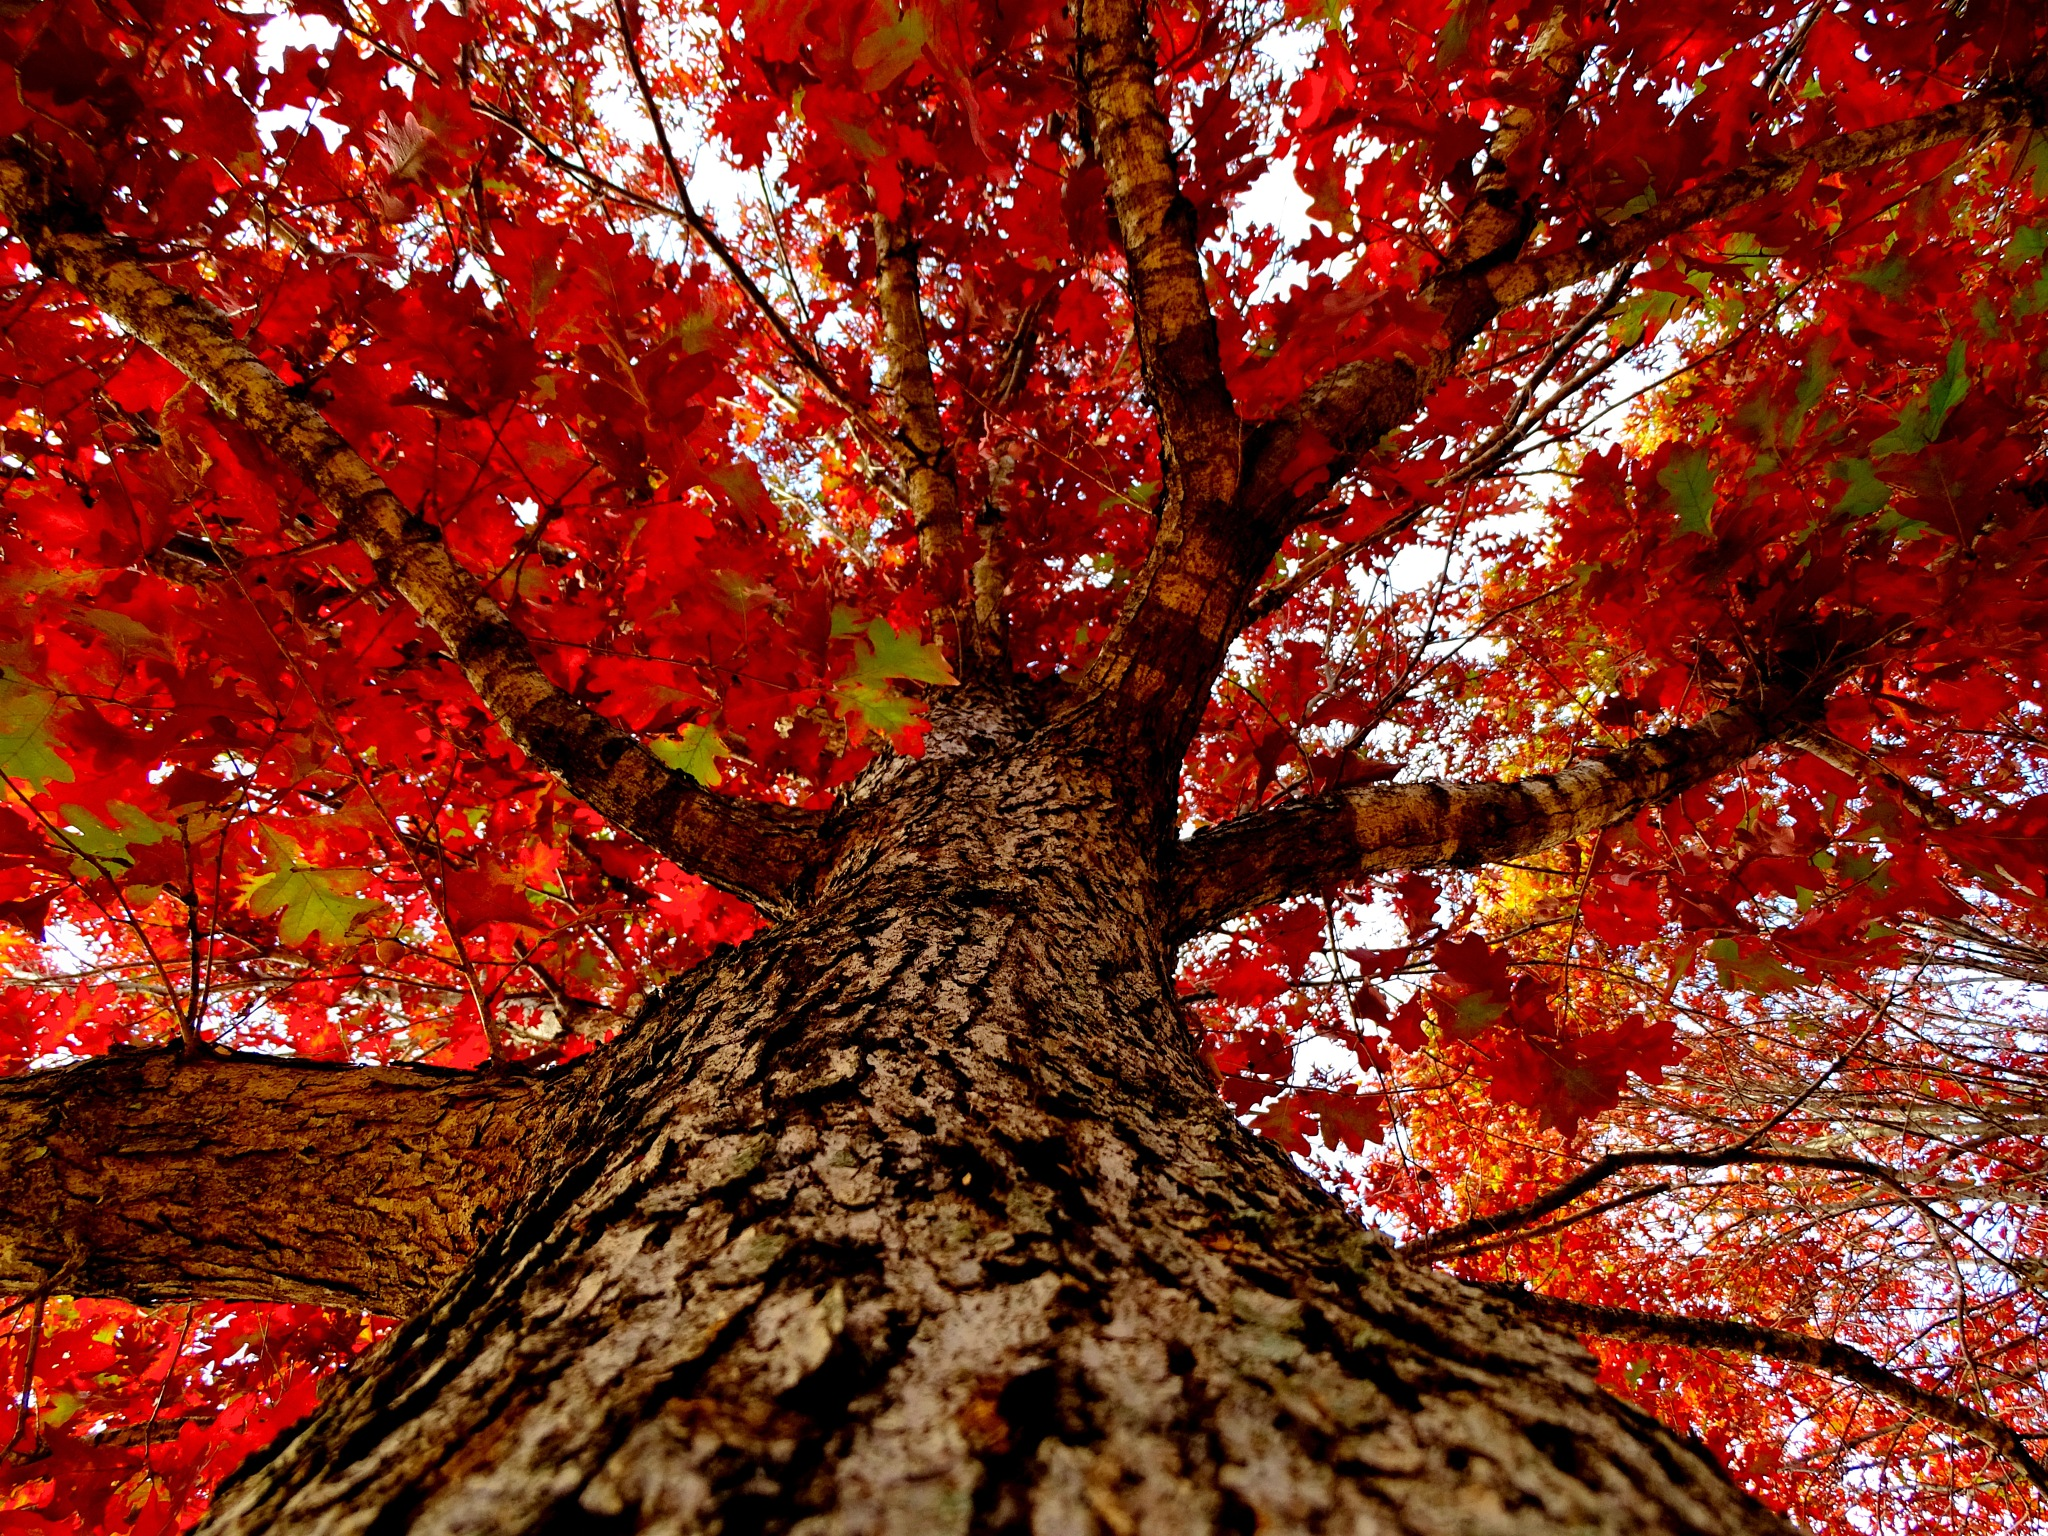 Fall by Patty Stockton